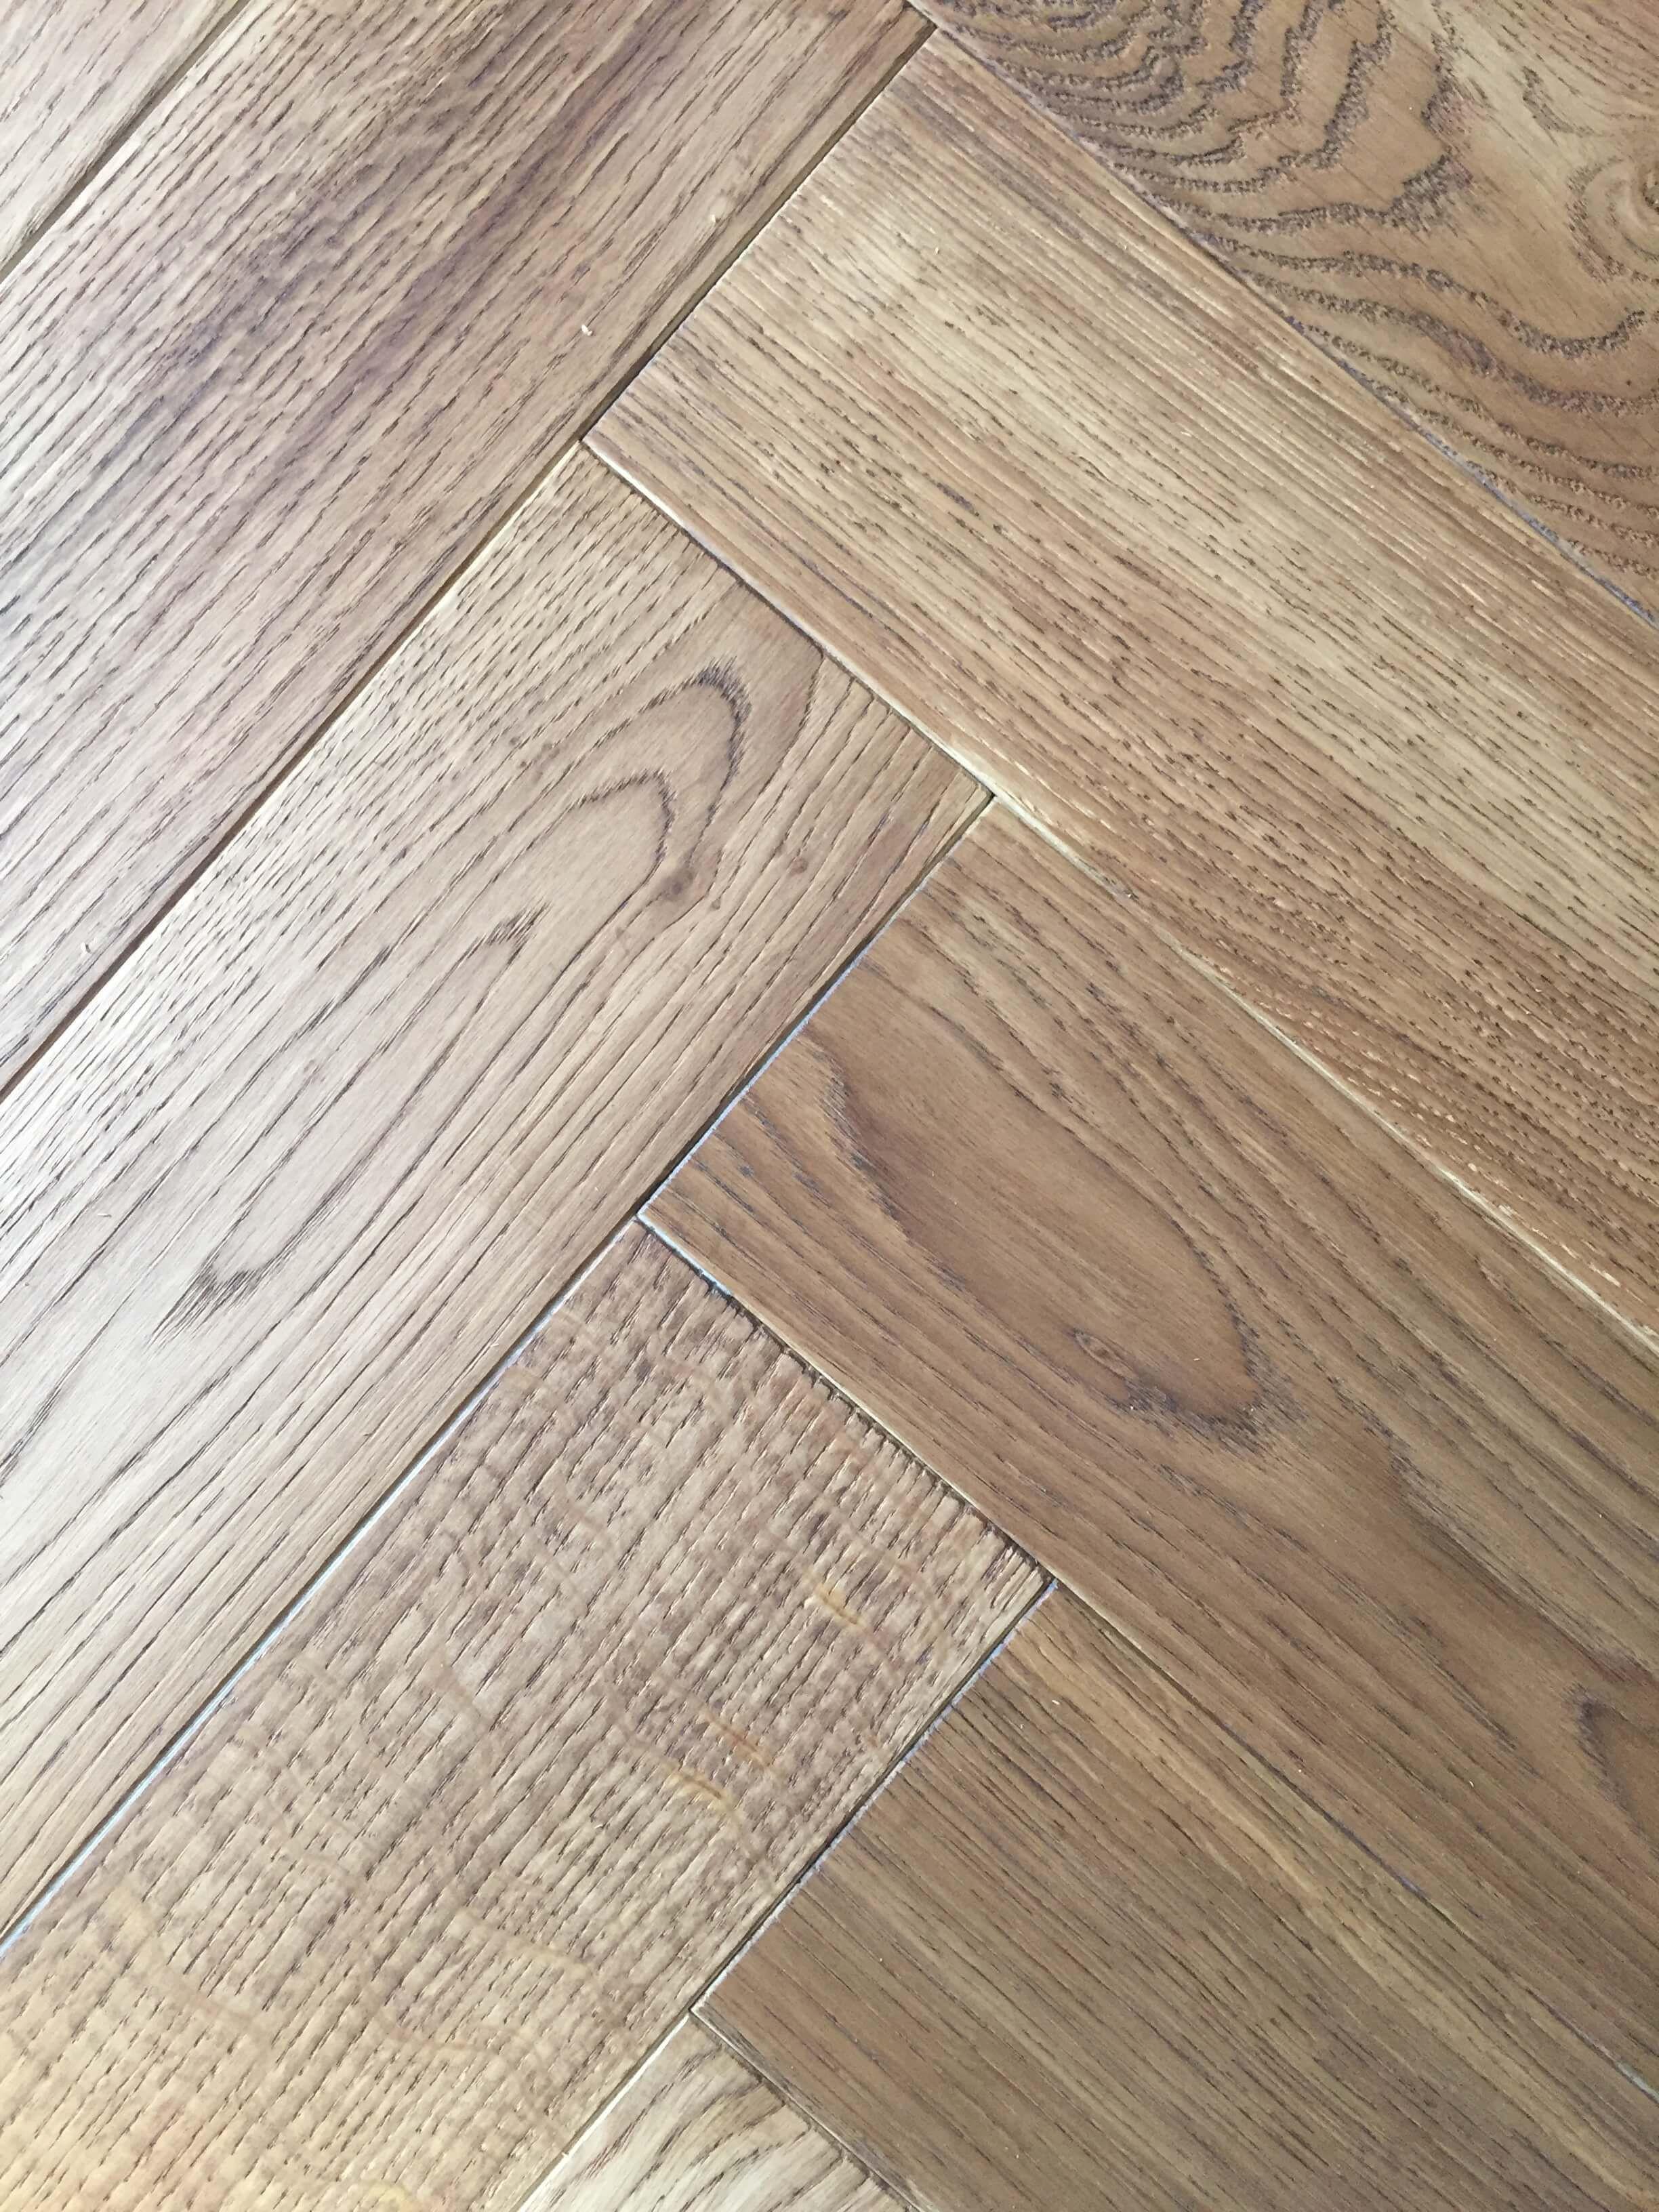 How to Install Hardwood Floors On A Slab Foundation Of How to Install Wood Flooring Floor Plan Ideas within How to Install Wood Flooring Laminate Flooring Looks Like Wood New Naturalny Dub Od Belgickaho